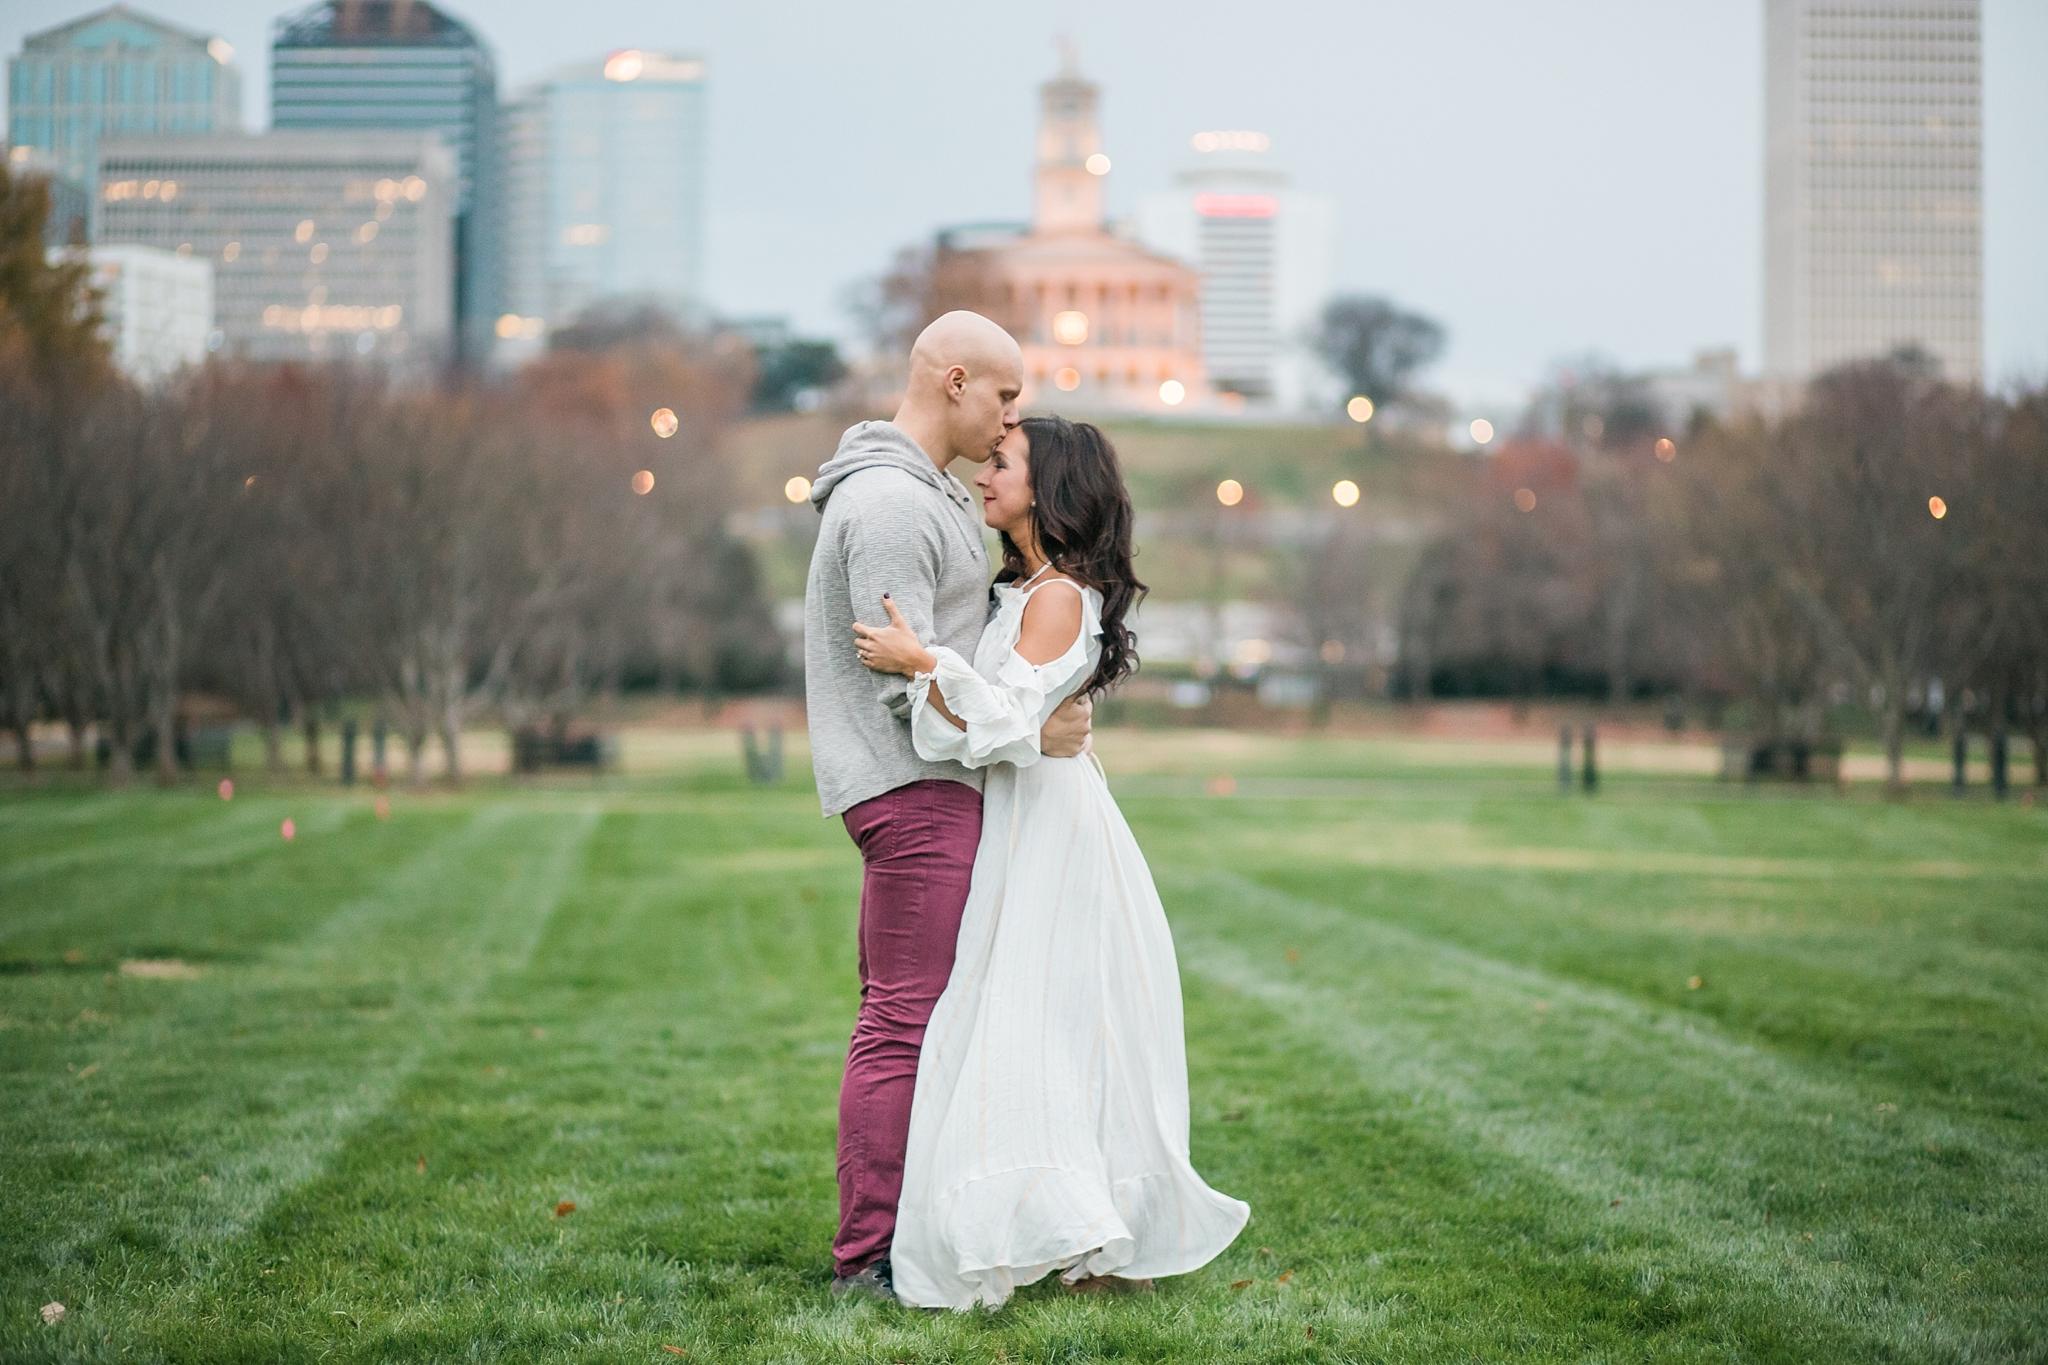 wedding-photographers-nashville-skyline.jpg